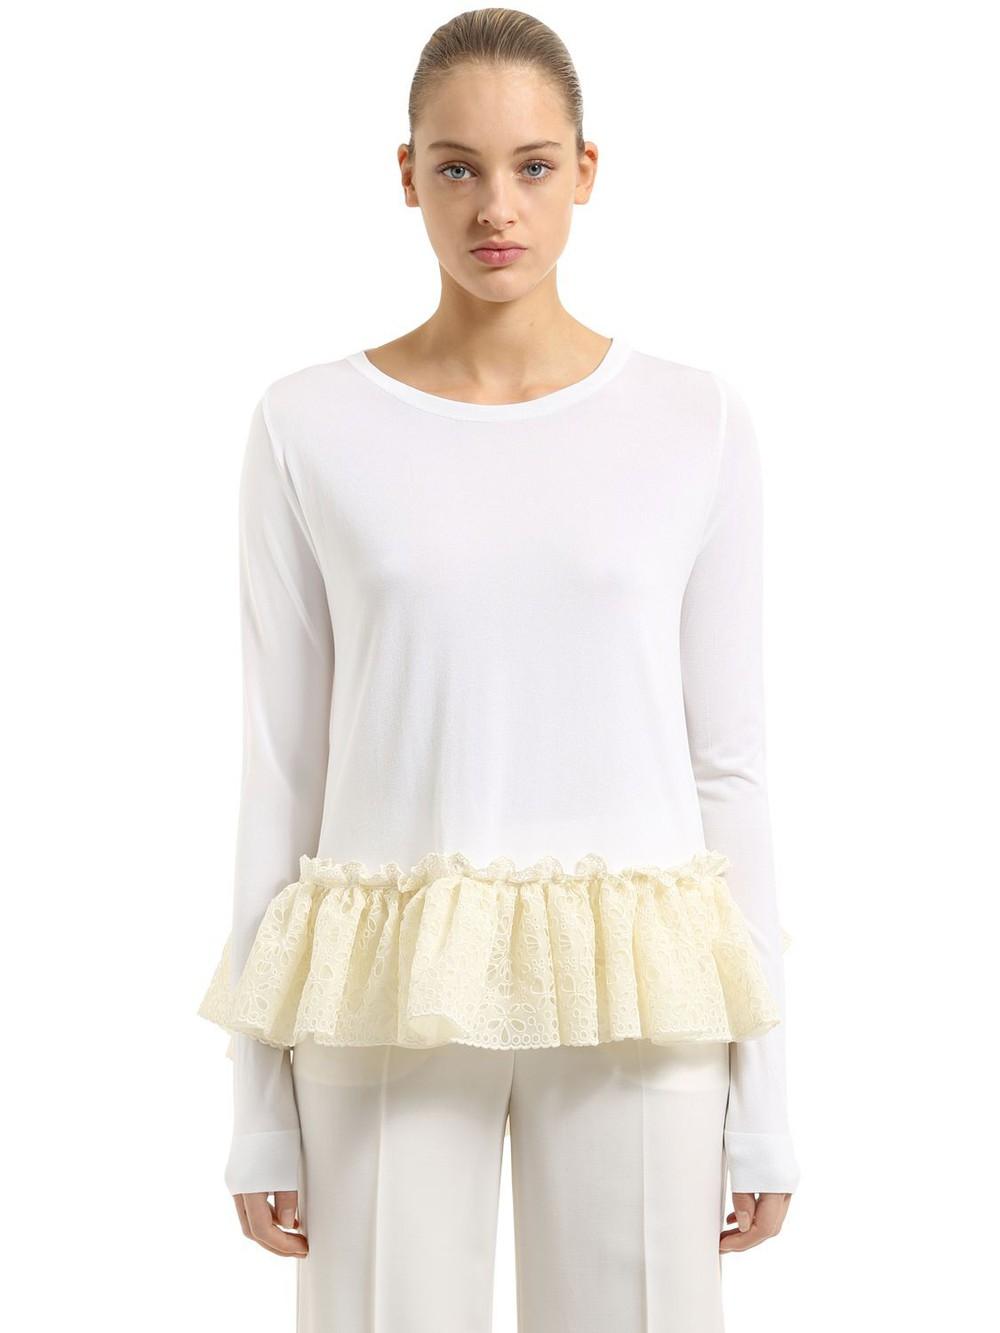 ANTONIO BERARDI Knit Sweater With Ruffled Lace Hem in white